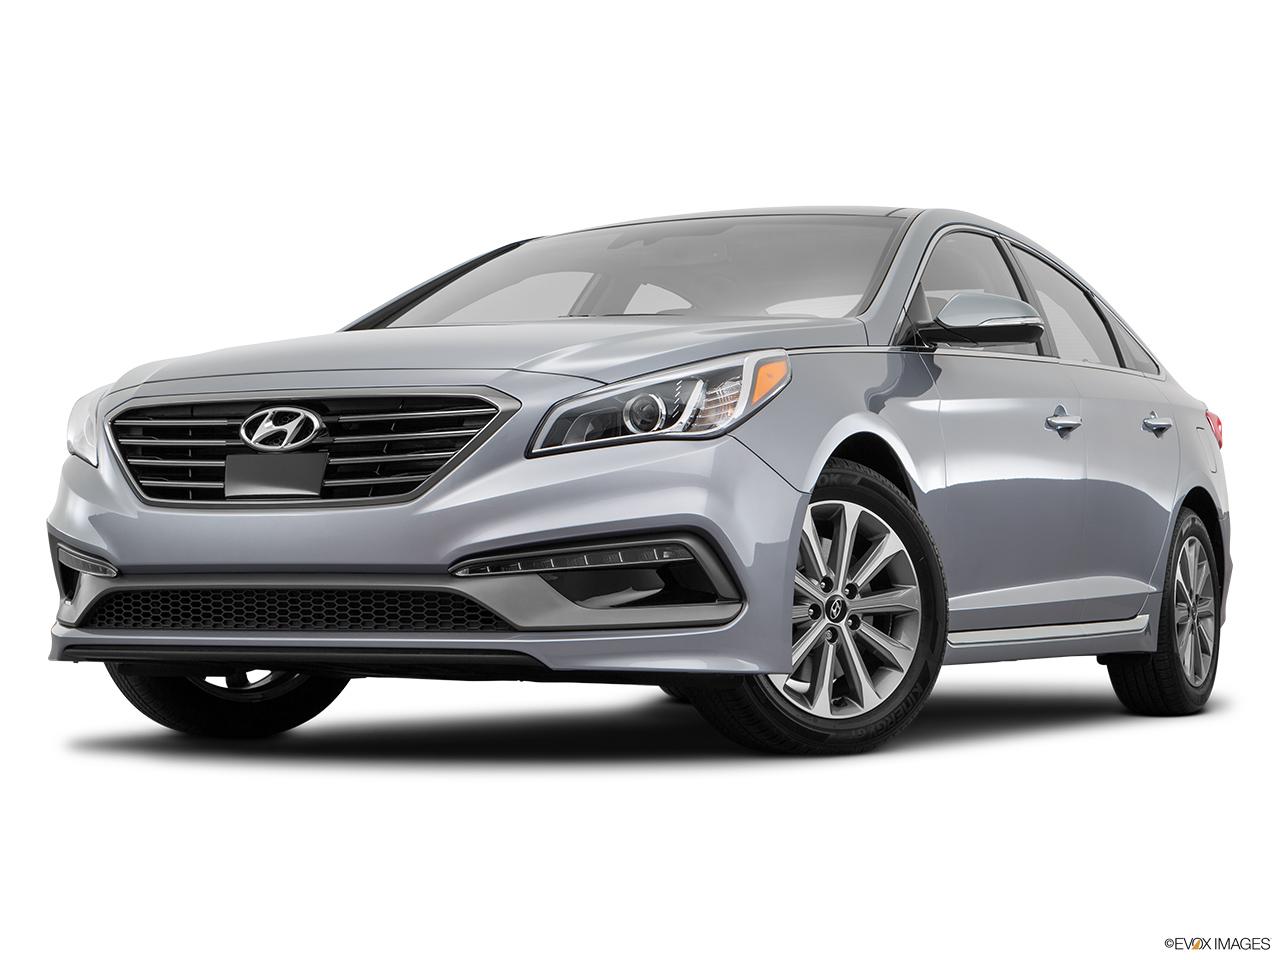 hyundai sonata 2016 2 4l top in uae new car prices specs. Black Bedroom Furniture Sets. Home Design Ideas